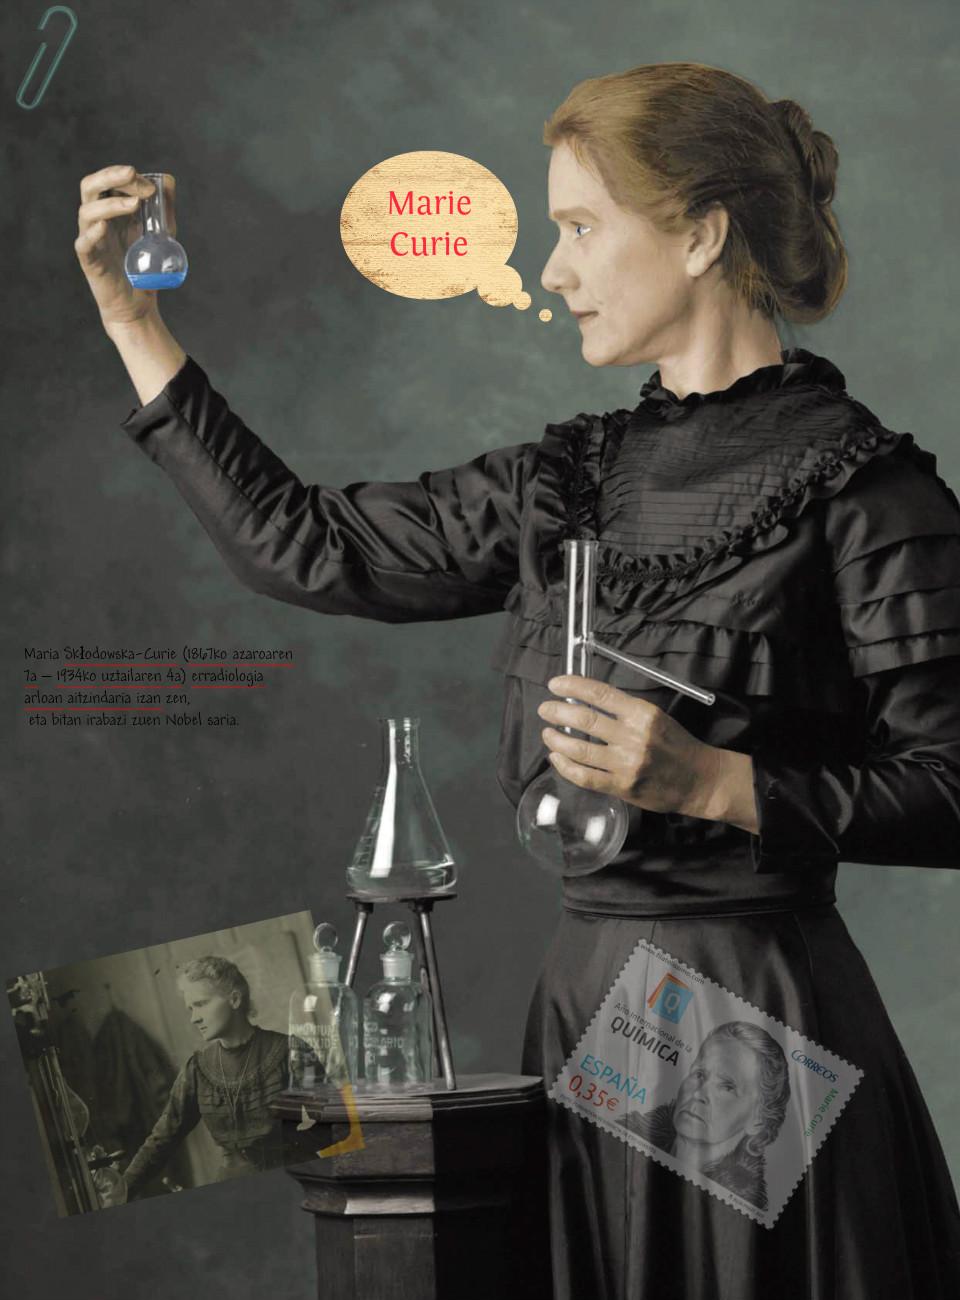 pdf François Truffaut: The Lost Secret 2013